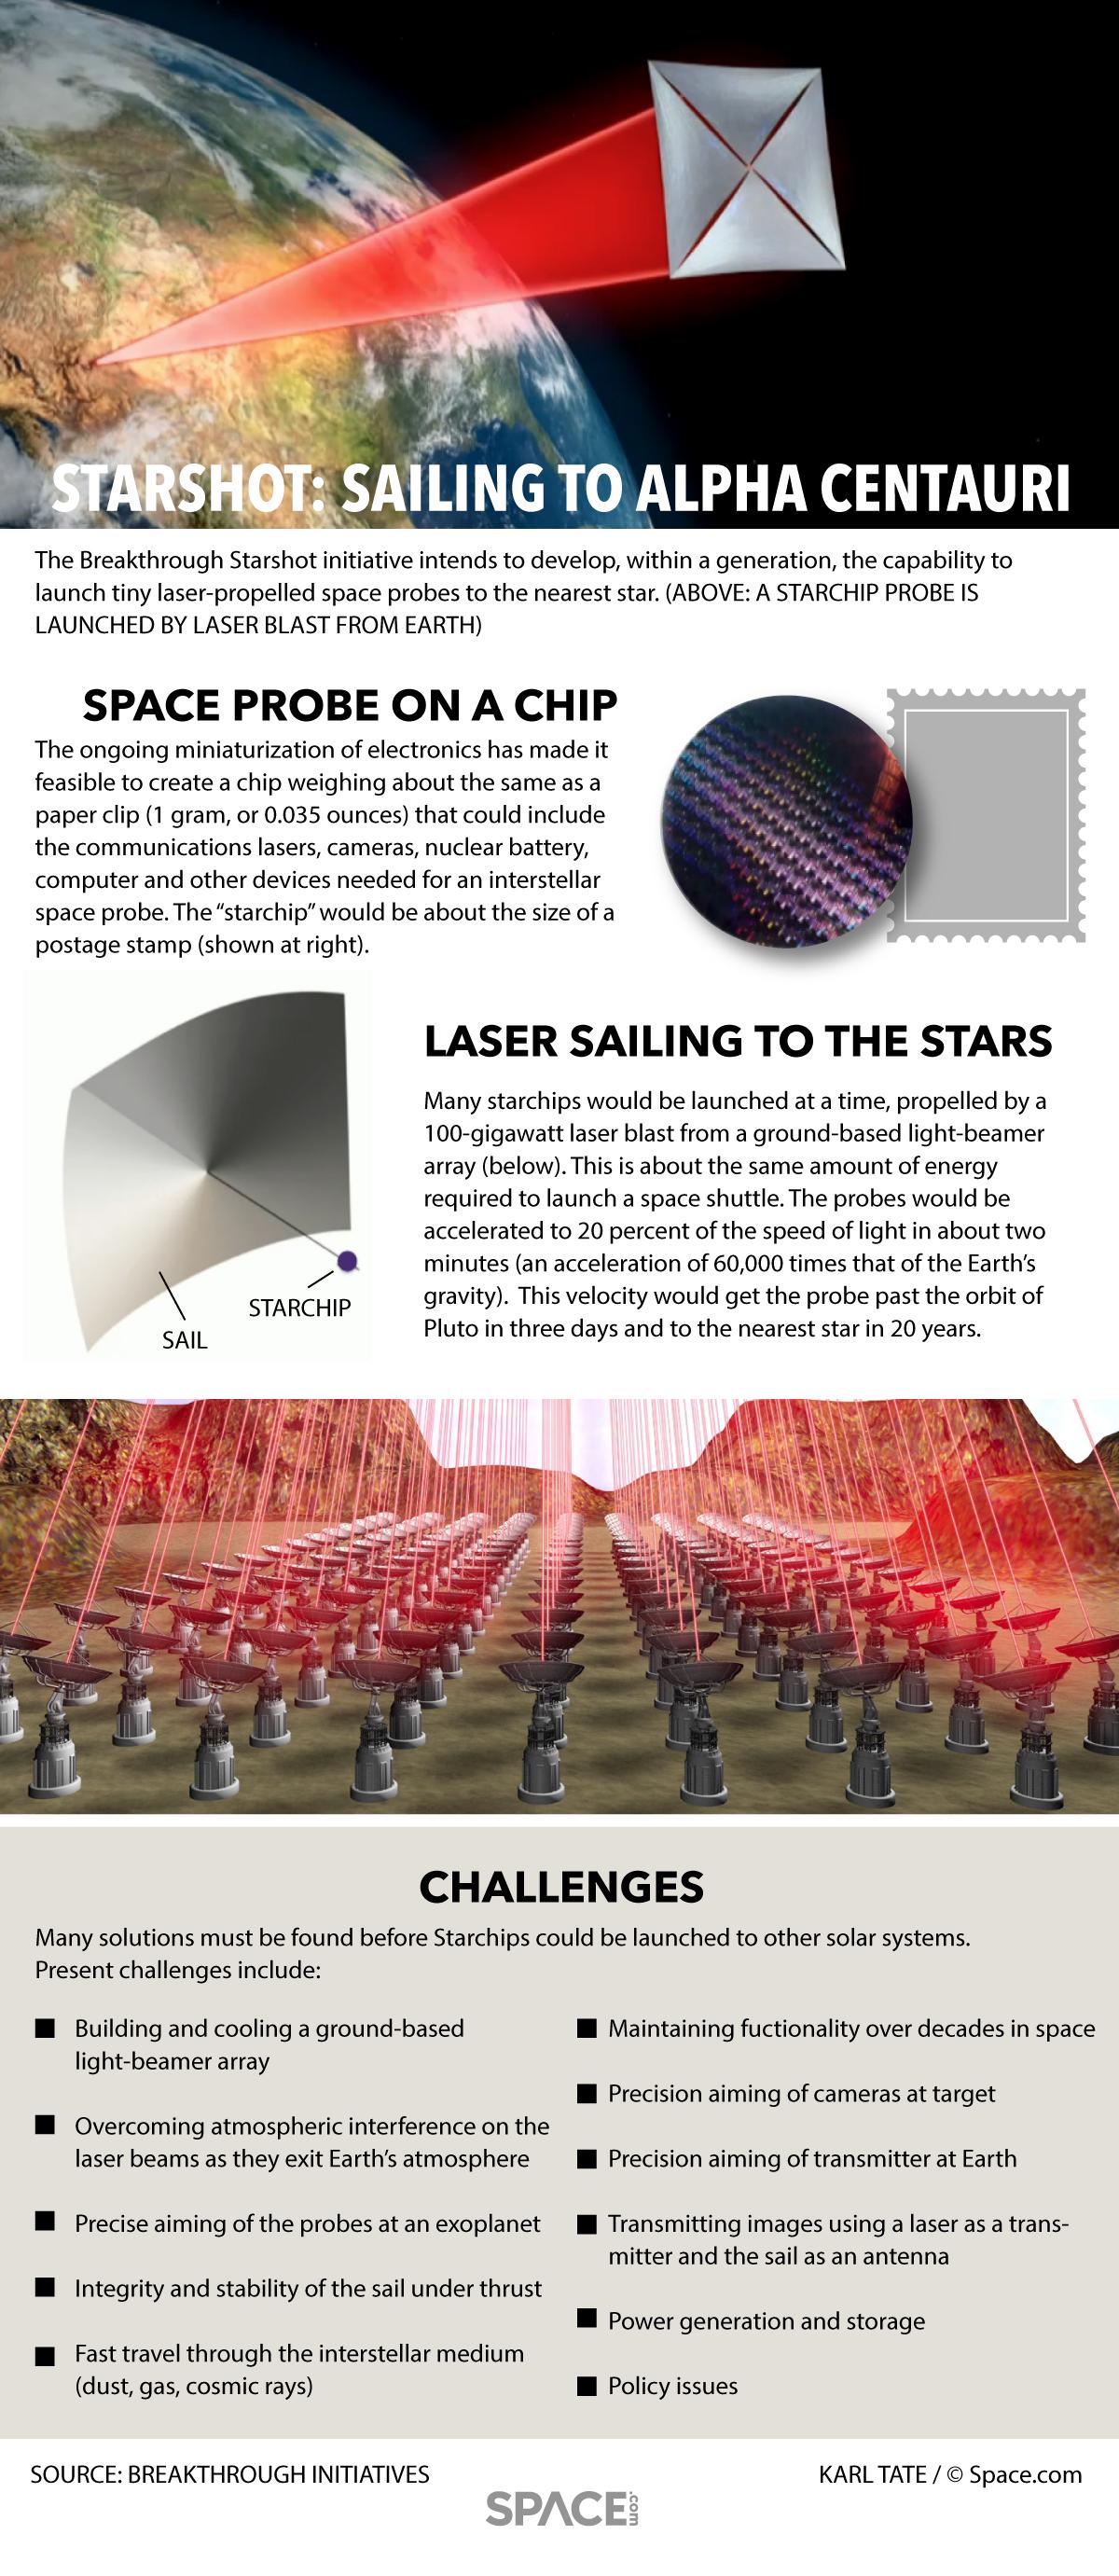 starshot-starchip-alpha-centauri-160412b-02.jpg?interpolation=lanczos-none&downsize=600:*